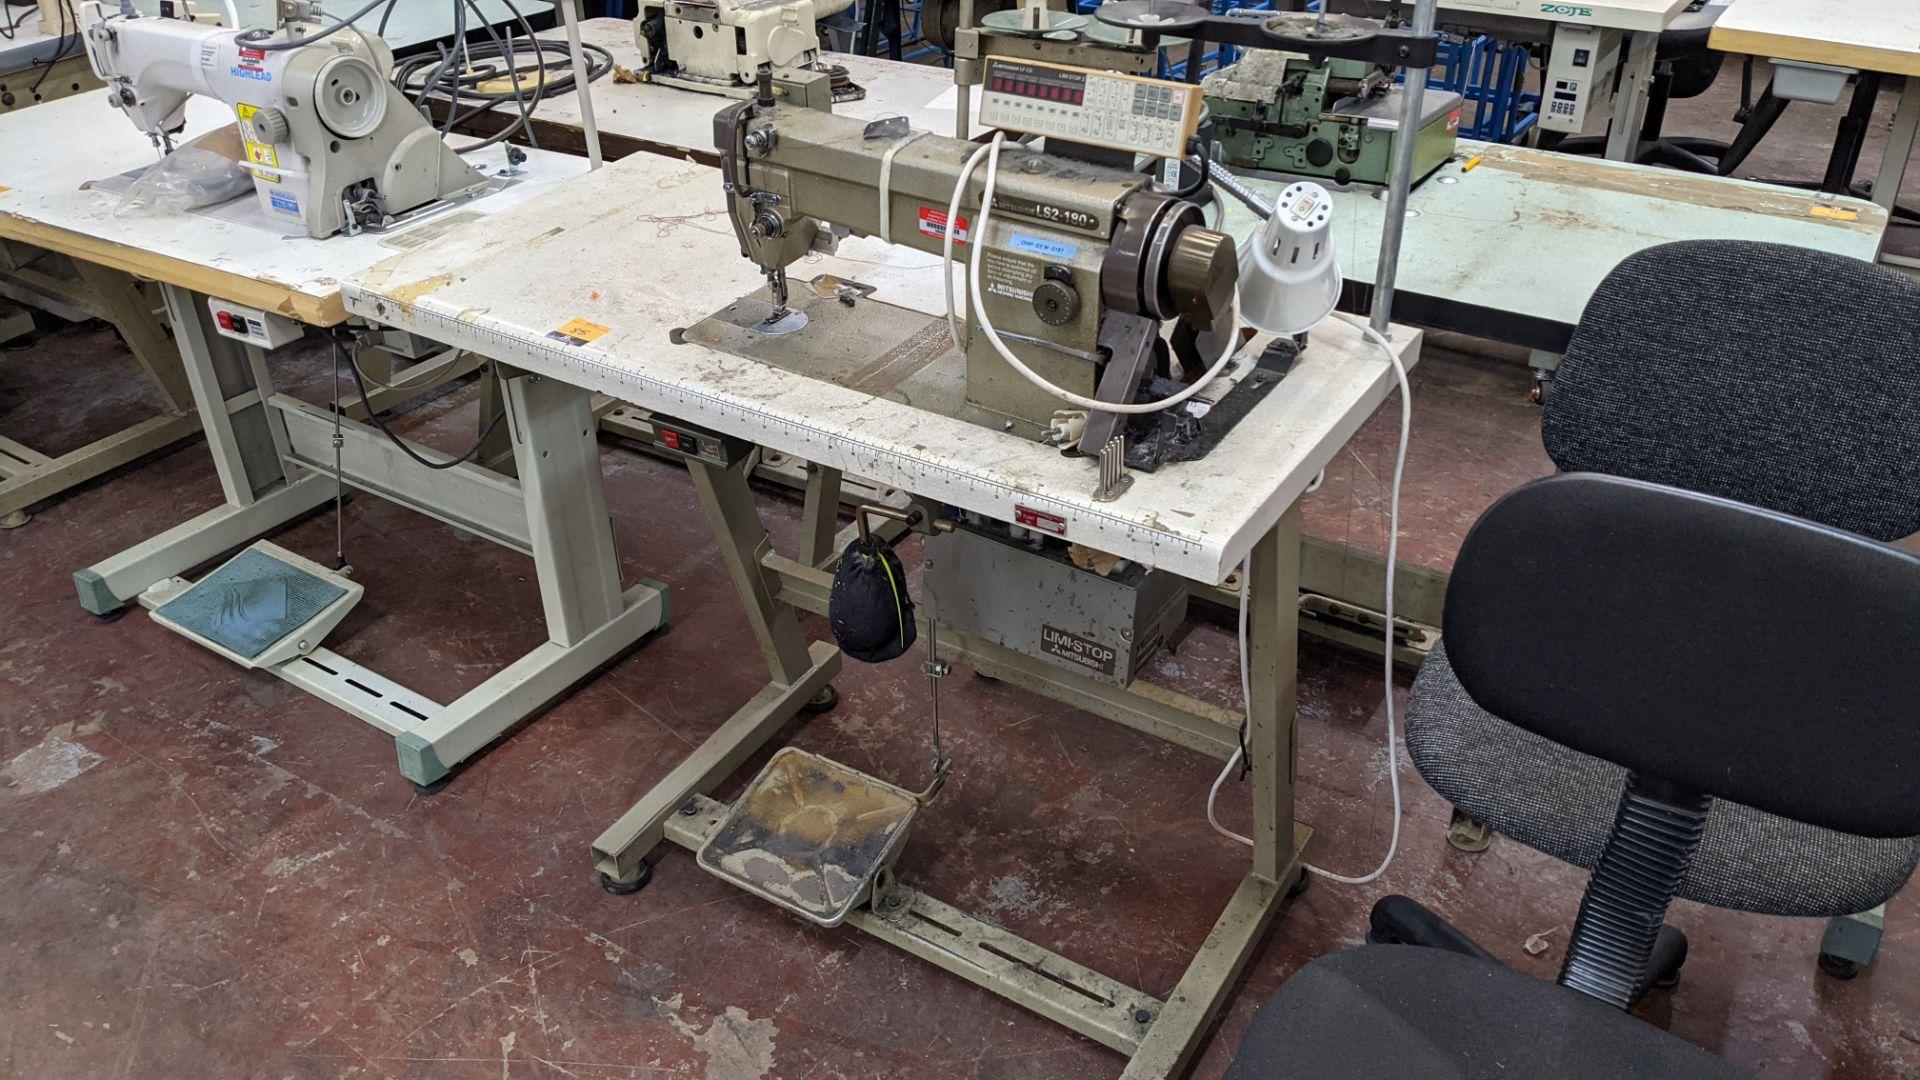 Mitsubishi LS2-180 sewing machine with Mitsubishi LF-C8 digital controller